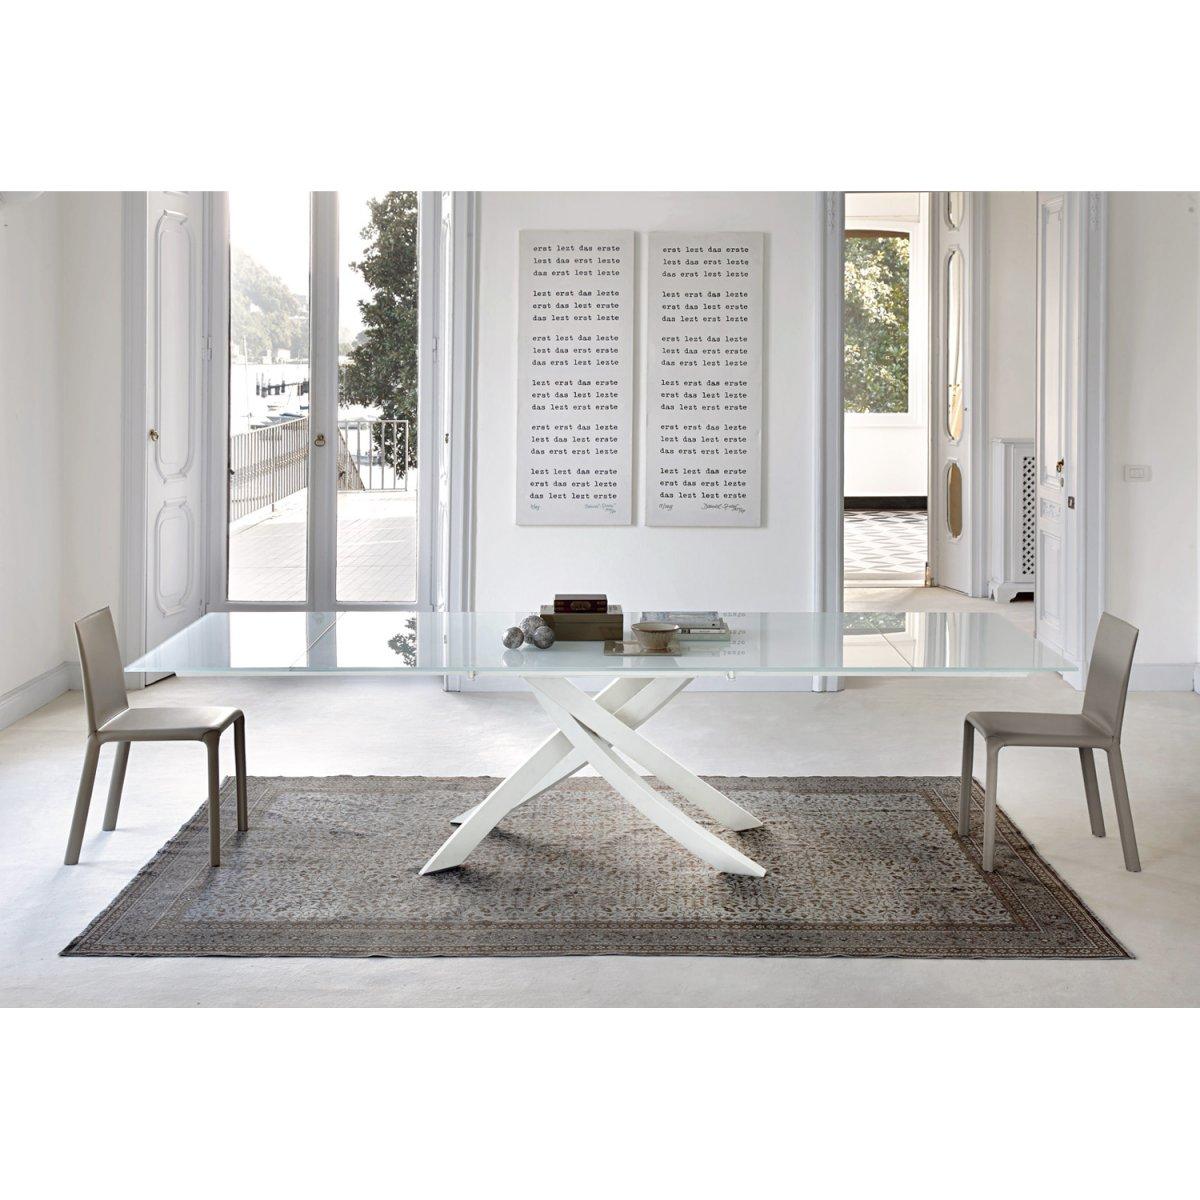 Bontempi Casa ARTISTICO Tisch 250X106 KRISTALLGLAS/LACKIERT